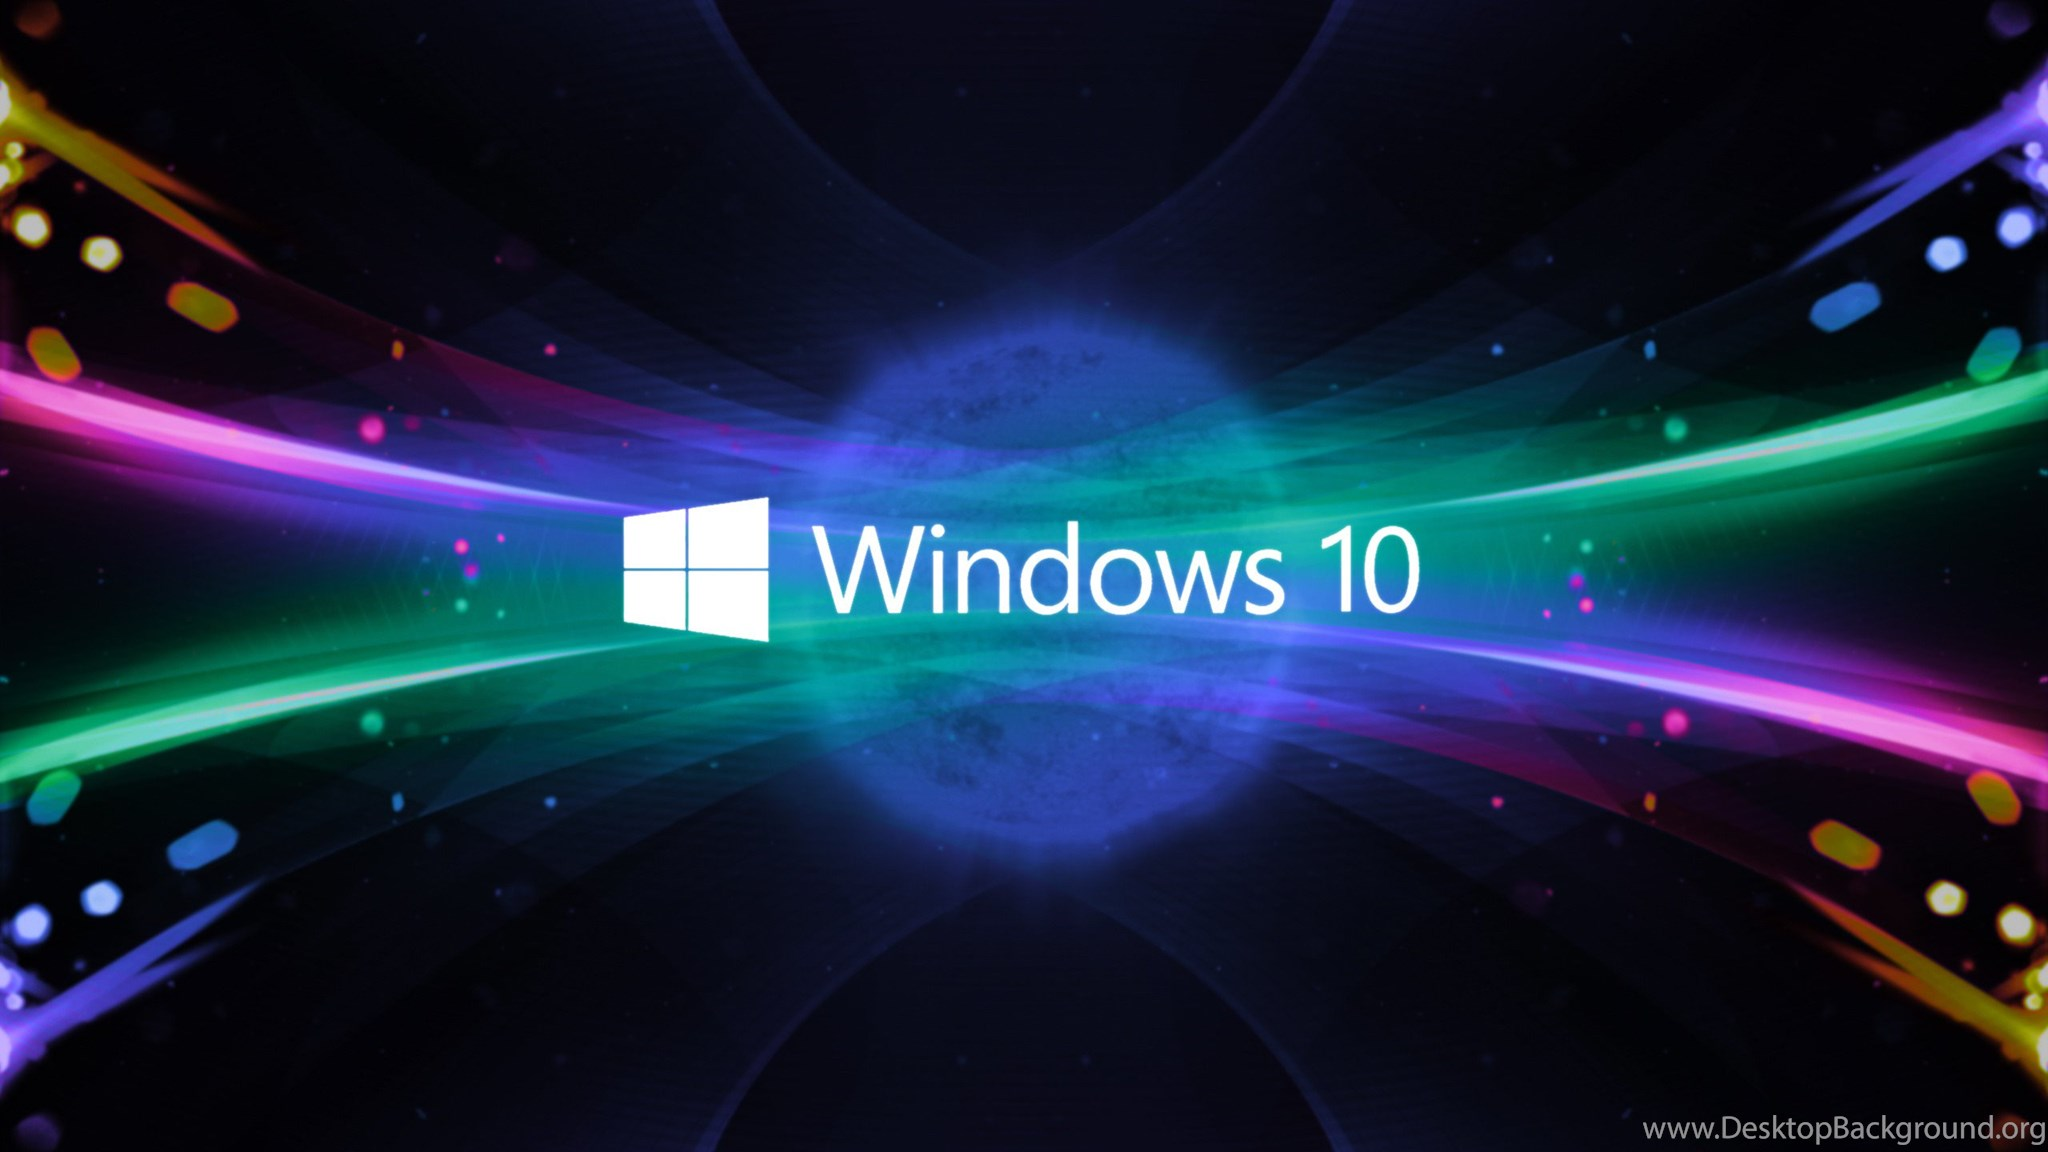 Windows 10 Wallpaper Desktop HDwallpaper4U com Desktop